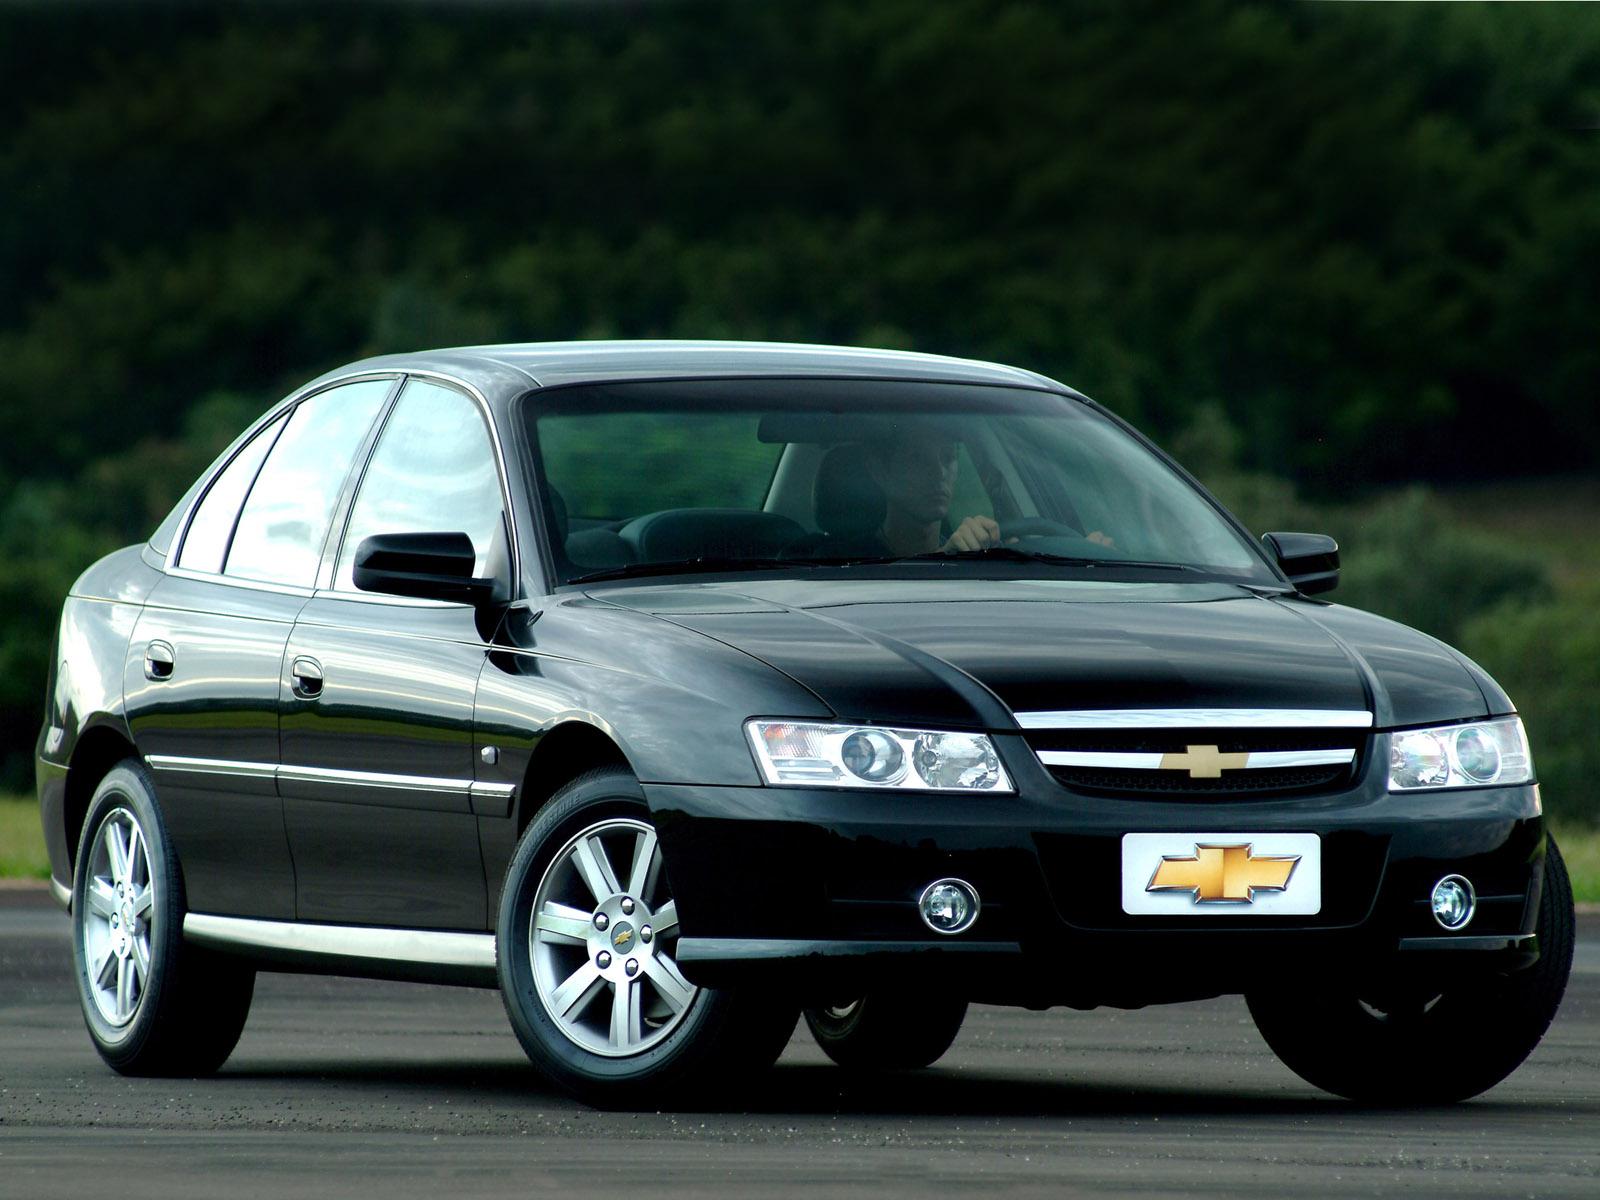 Chevrolet Omega 2005 foto - 4